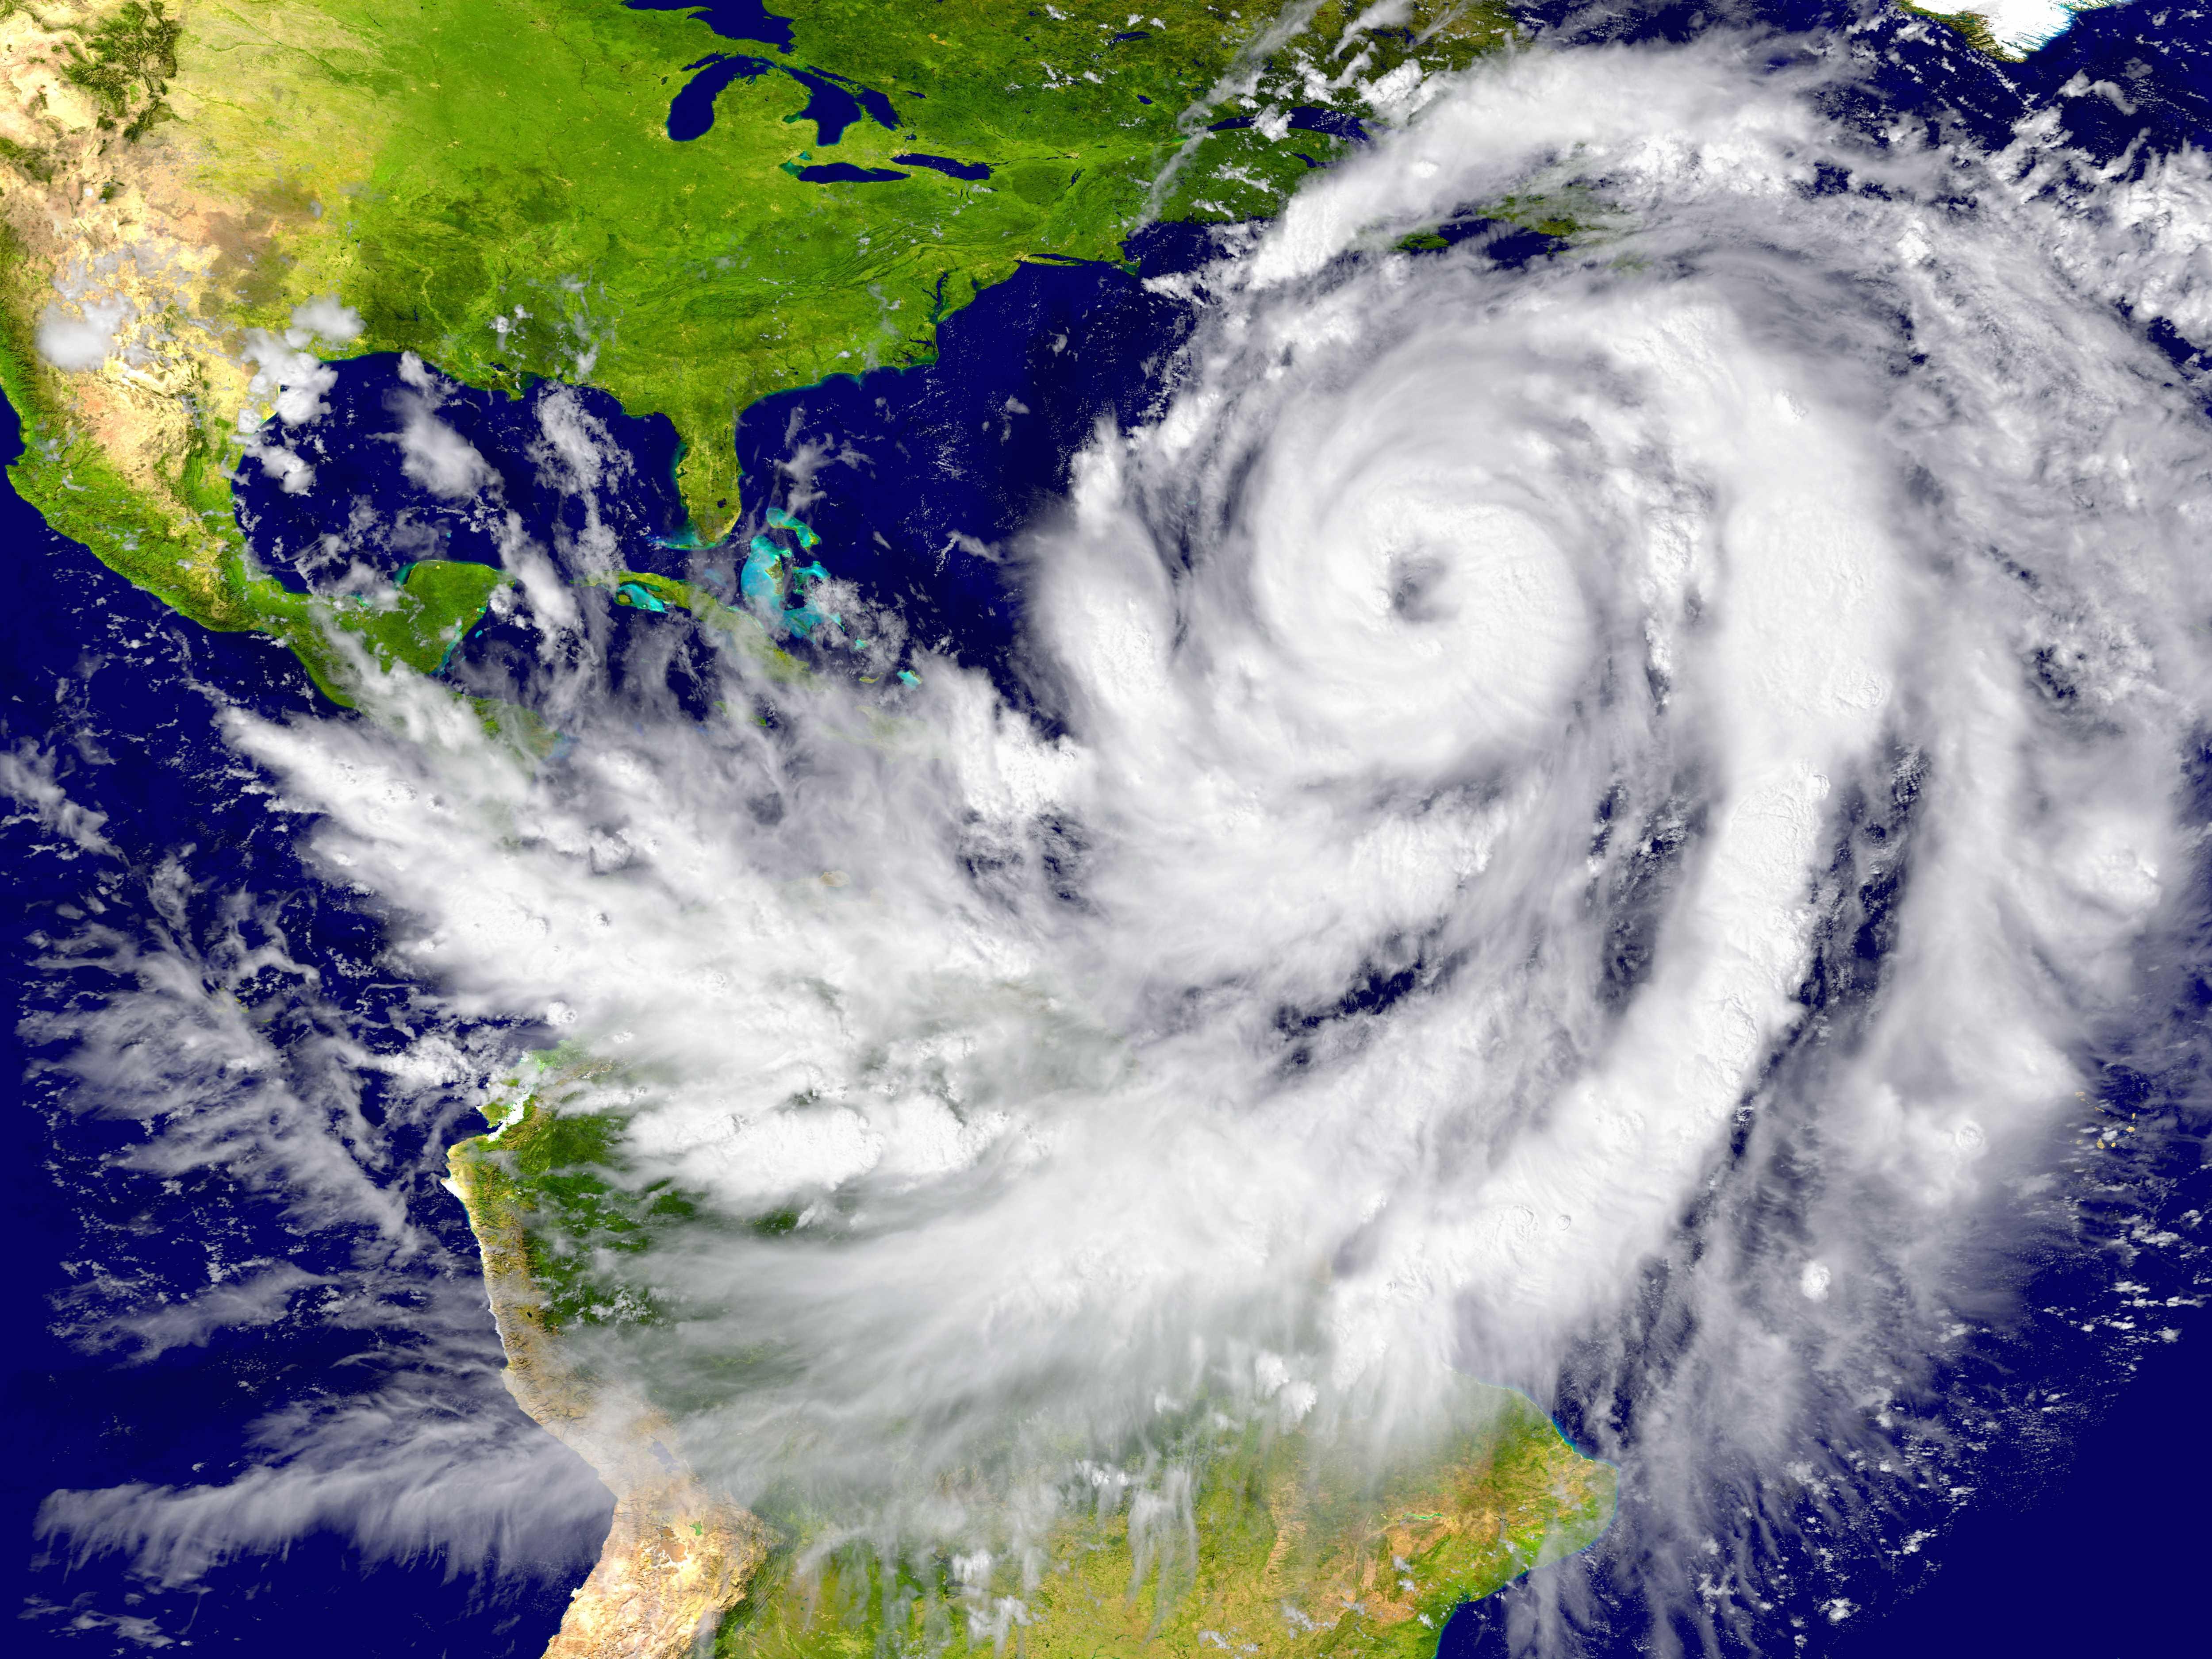 More active Atlantic hurricane season forecast for 2016